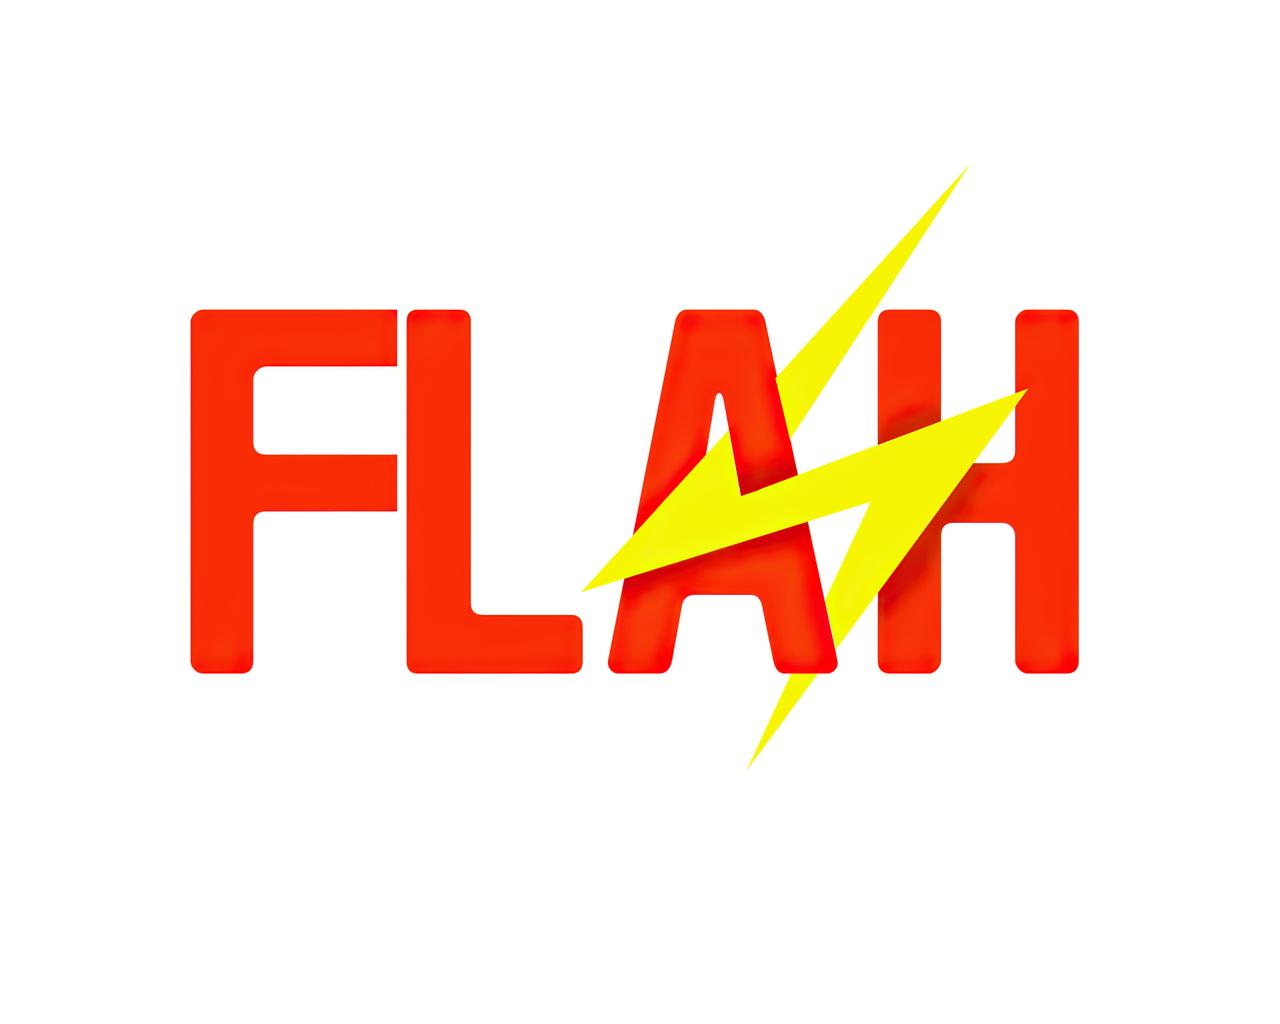 flash-logo-white-4k-68.jpg